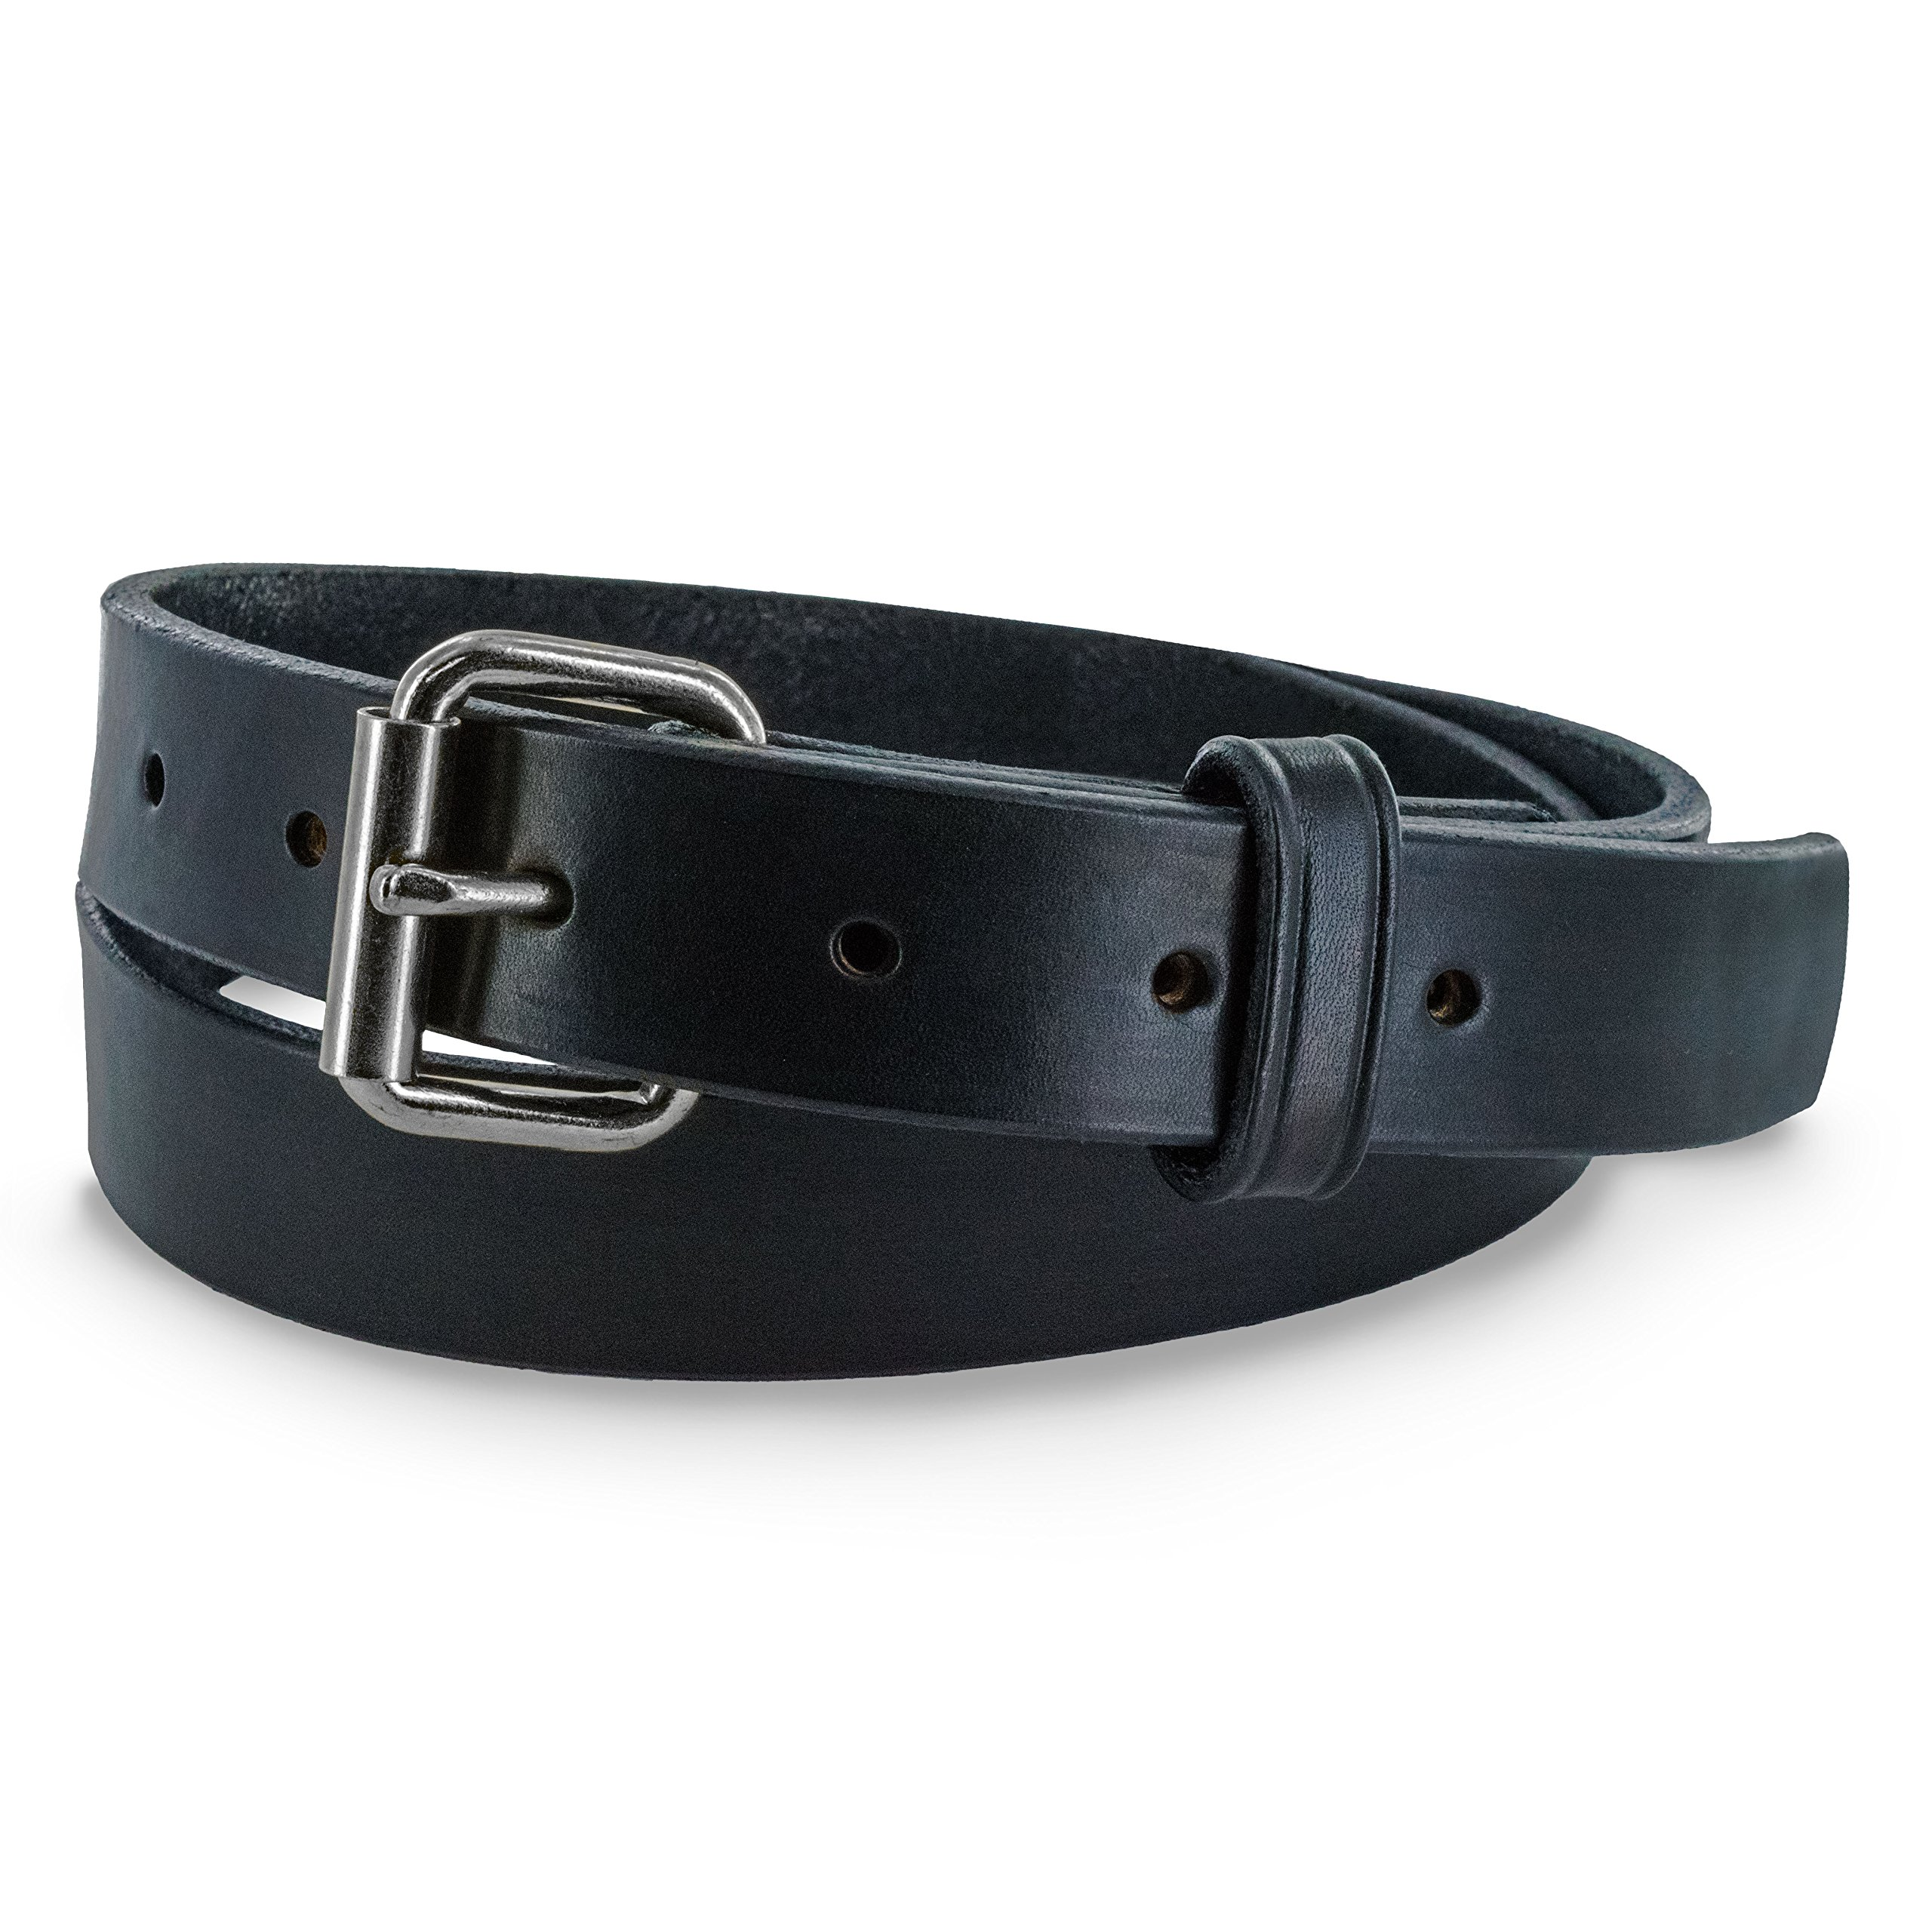 Hanks 1.25'' Leather Belt -Casual Jean Belt-USA Made,100-Year Warranty-The Deputy (Black, 32 - Fits 30 Pant) by Hanks Belts